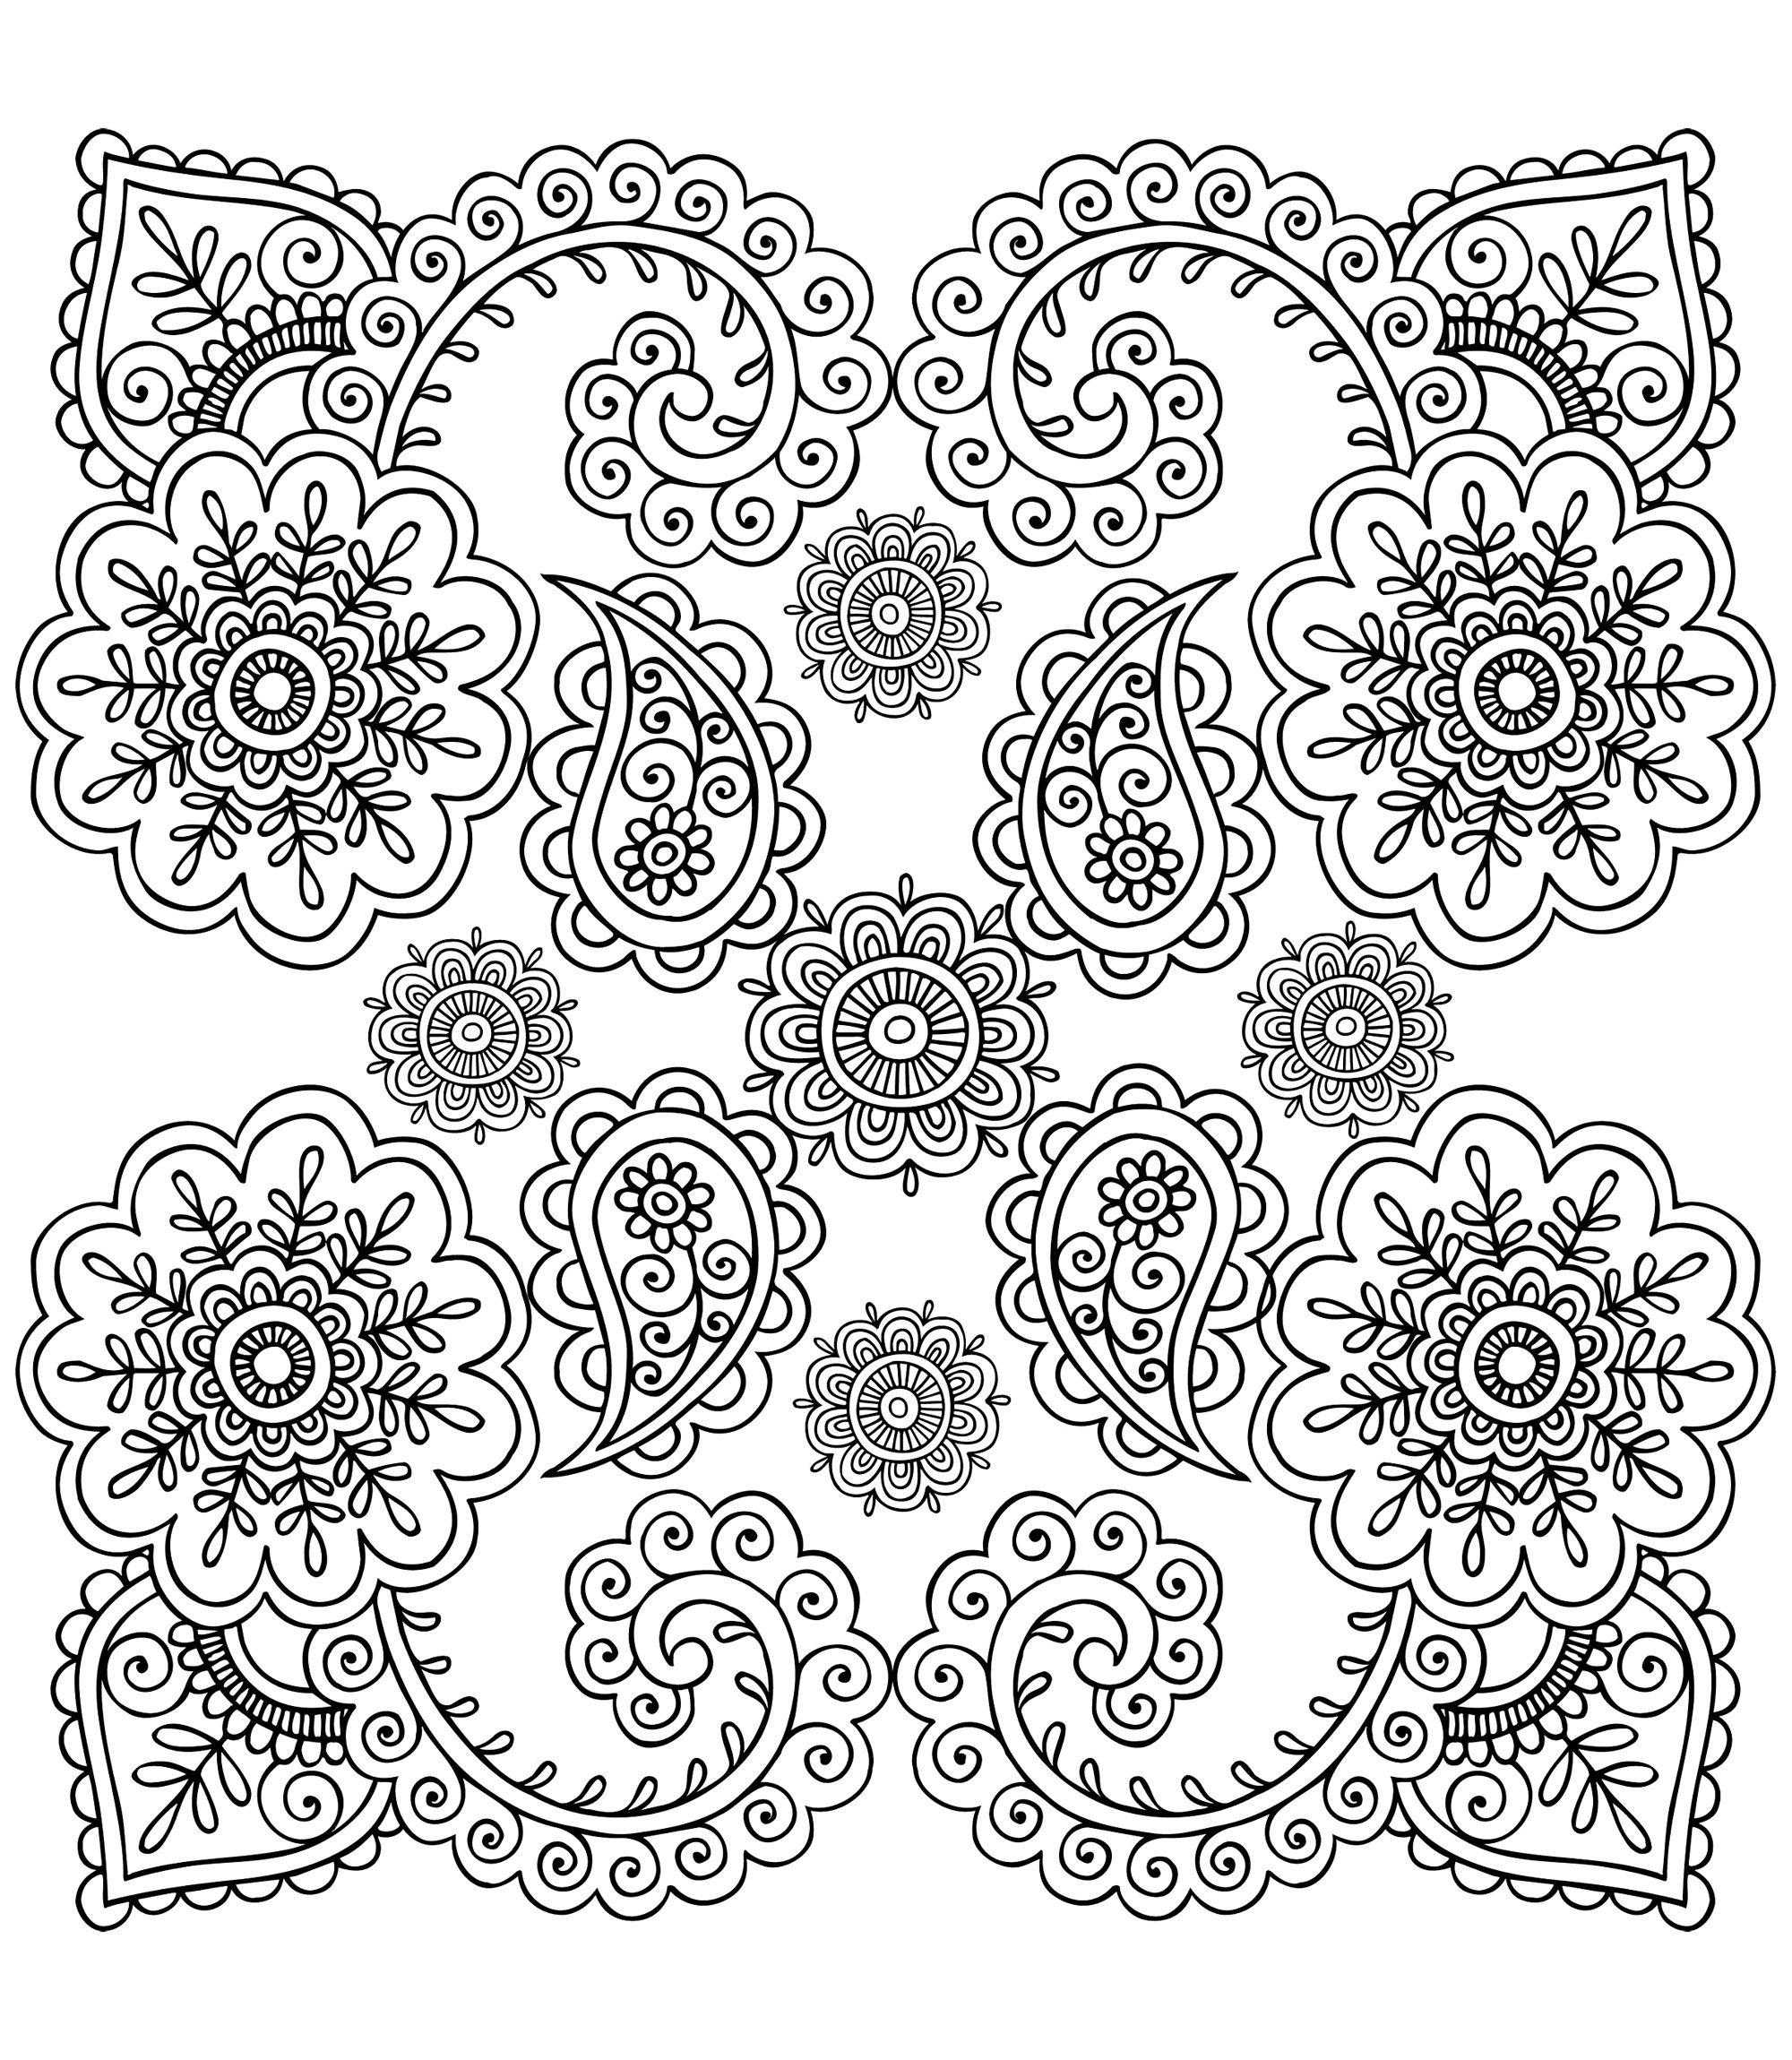 Free Coloring Page Coloring Anti Stress Flowers Mandalas